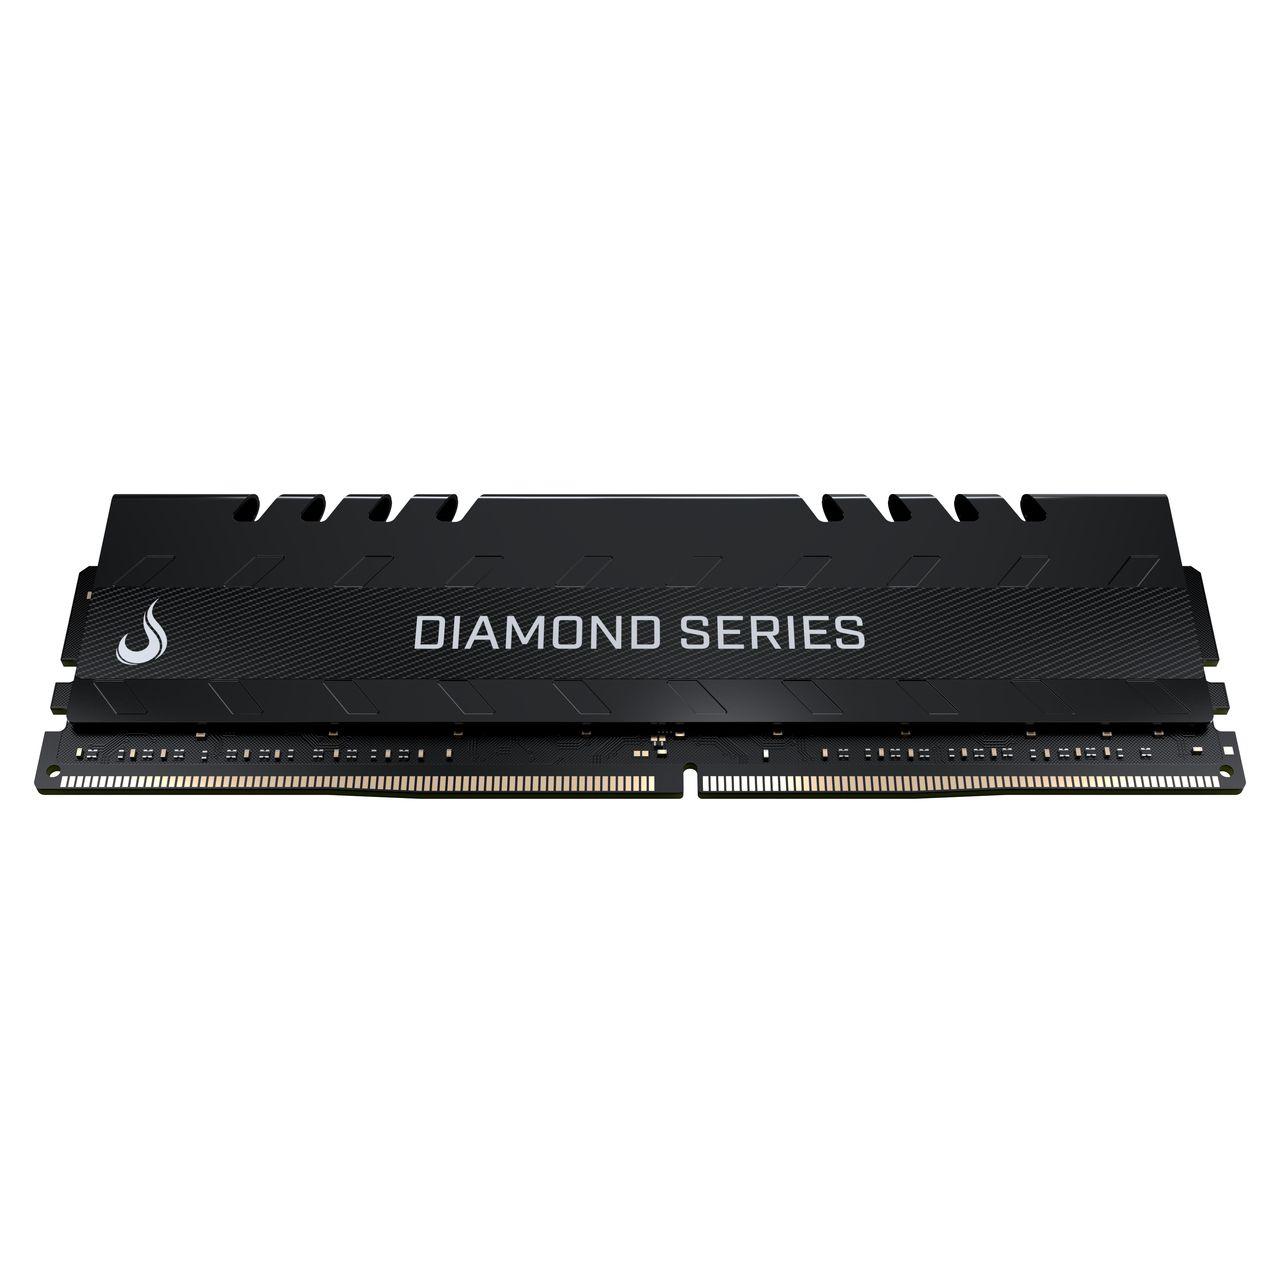 Memoria Ram DDR4 4GB 3000MHZ Diamond - RM-D4-4G-3000D  BLACK  - Loja Rise Mode